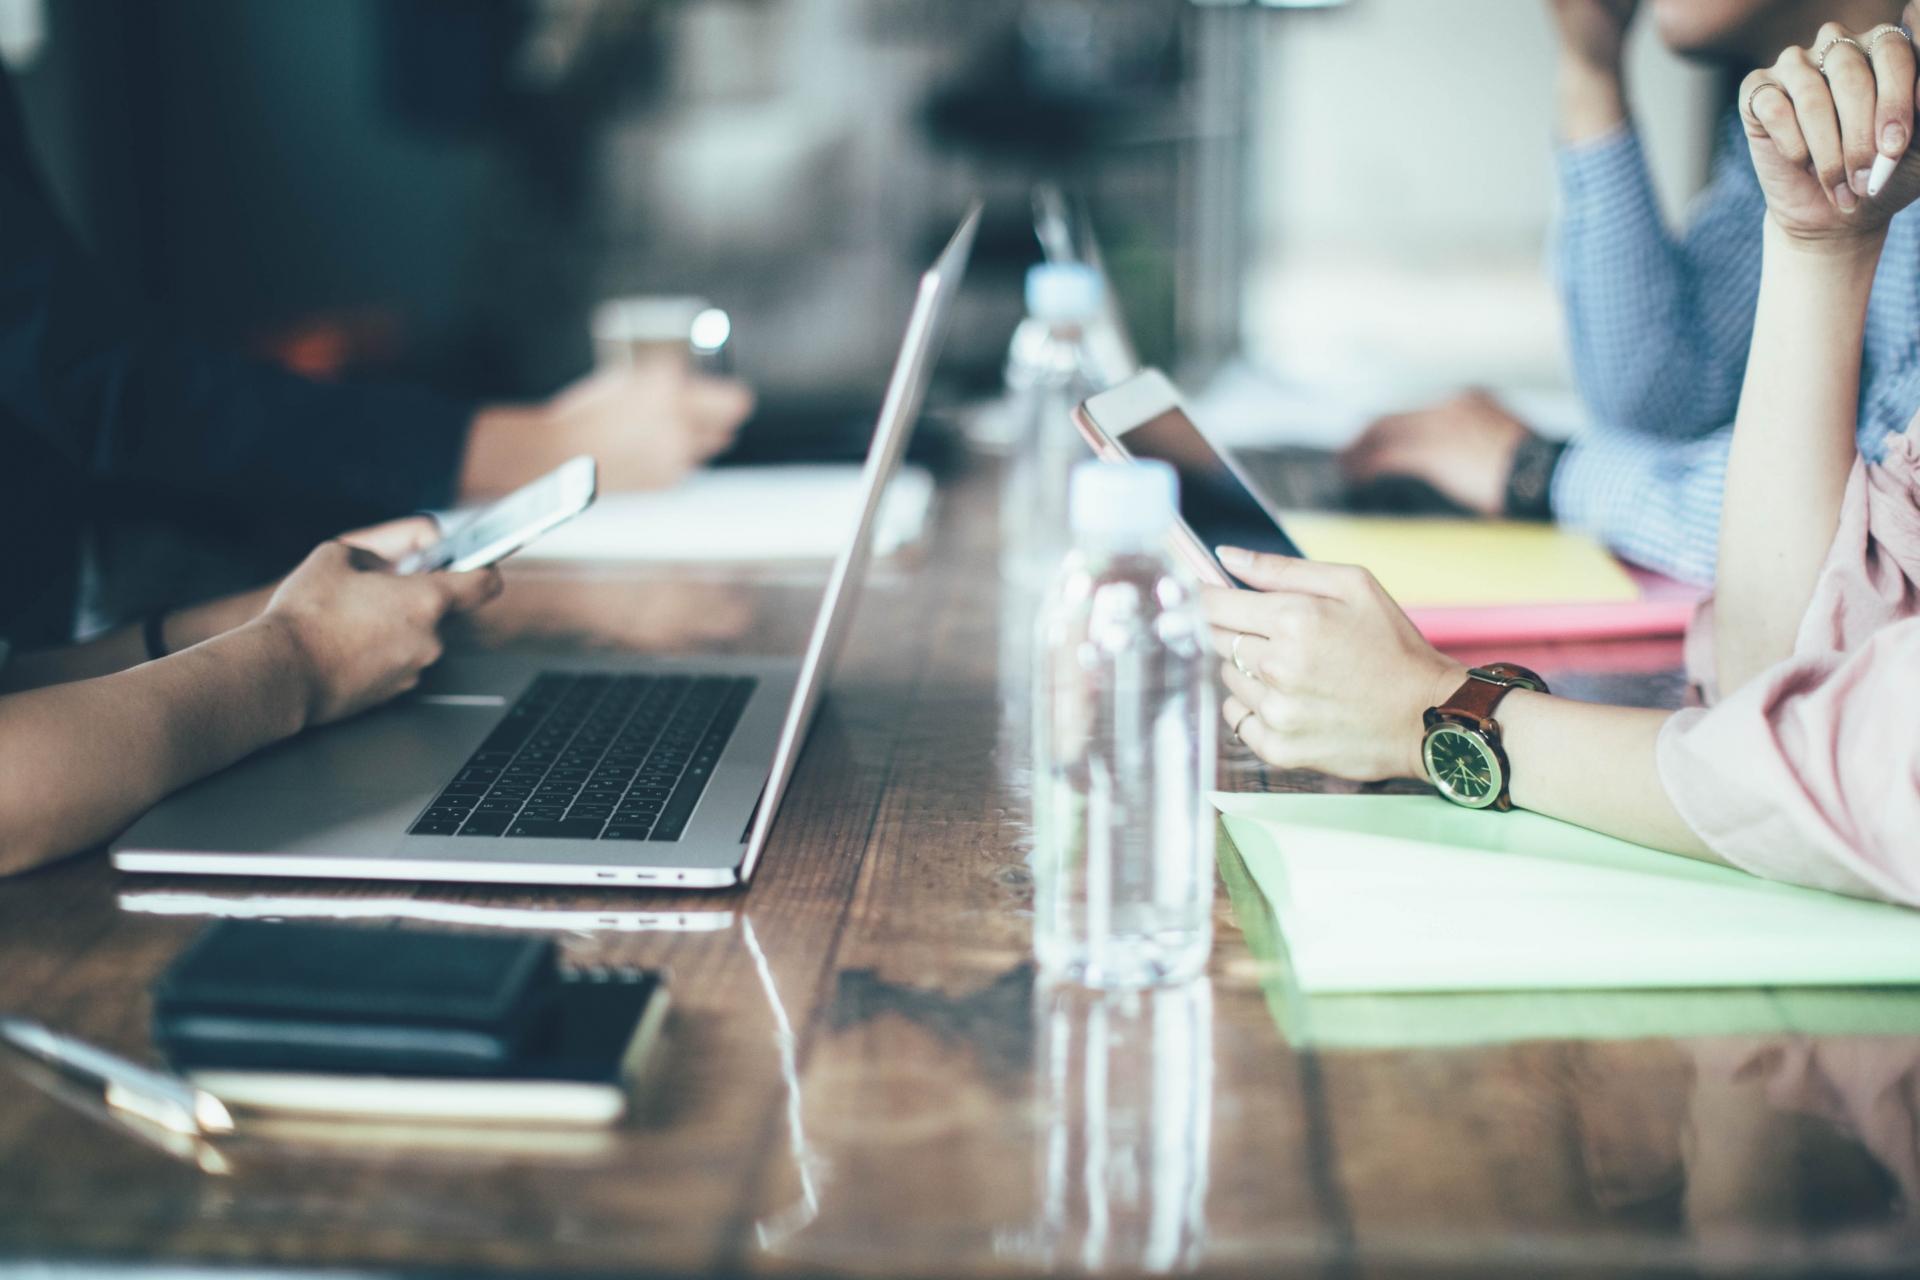 ECサイトのキャンペーン特典で効果のある顧客と目的と設定方法